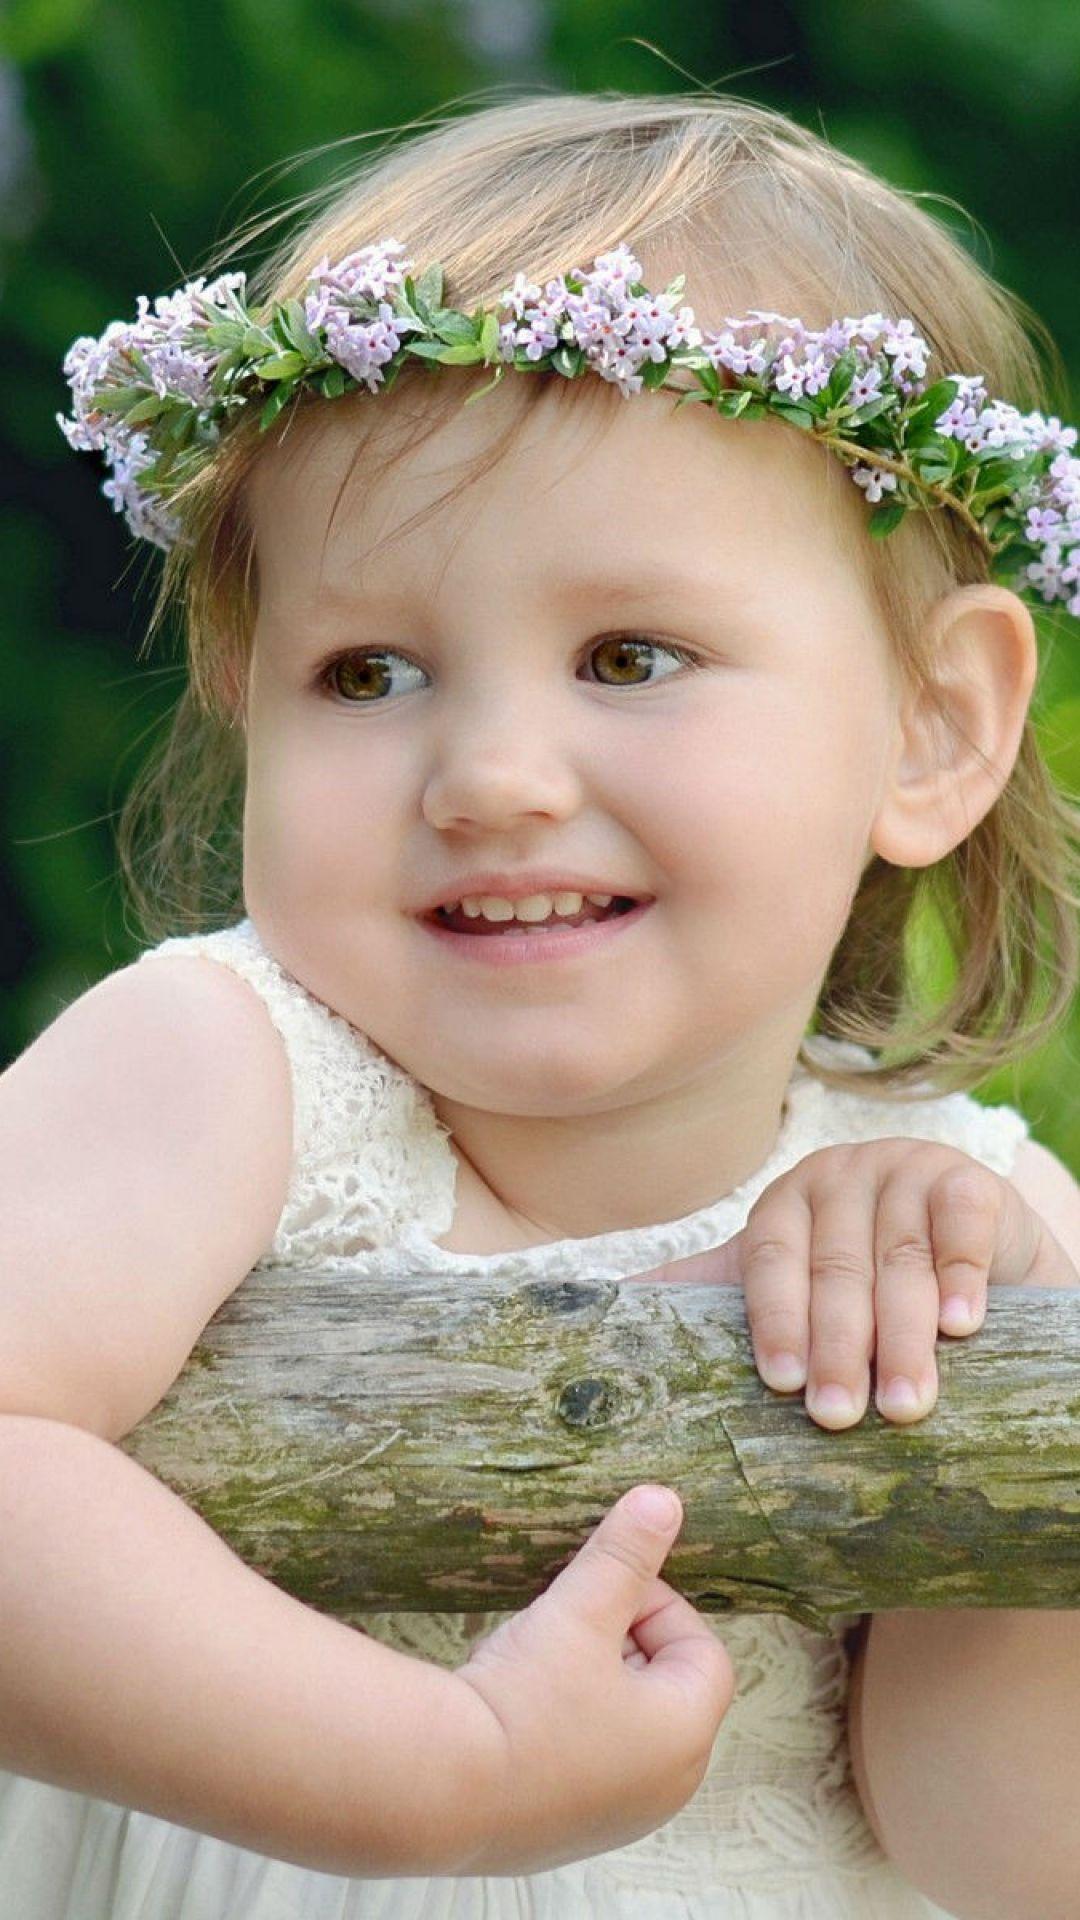 1080x1920 wallpaper child, girl, wreath, summer, smile faces1080x1920 wallpaper child, girl, wreath, summer, smile